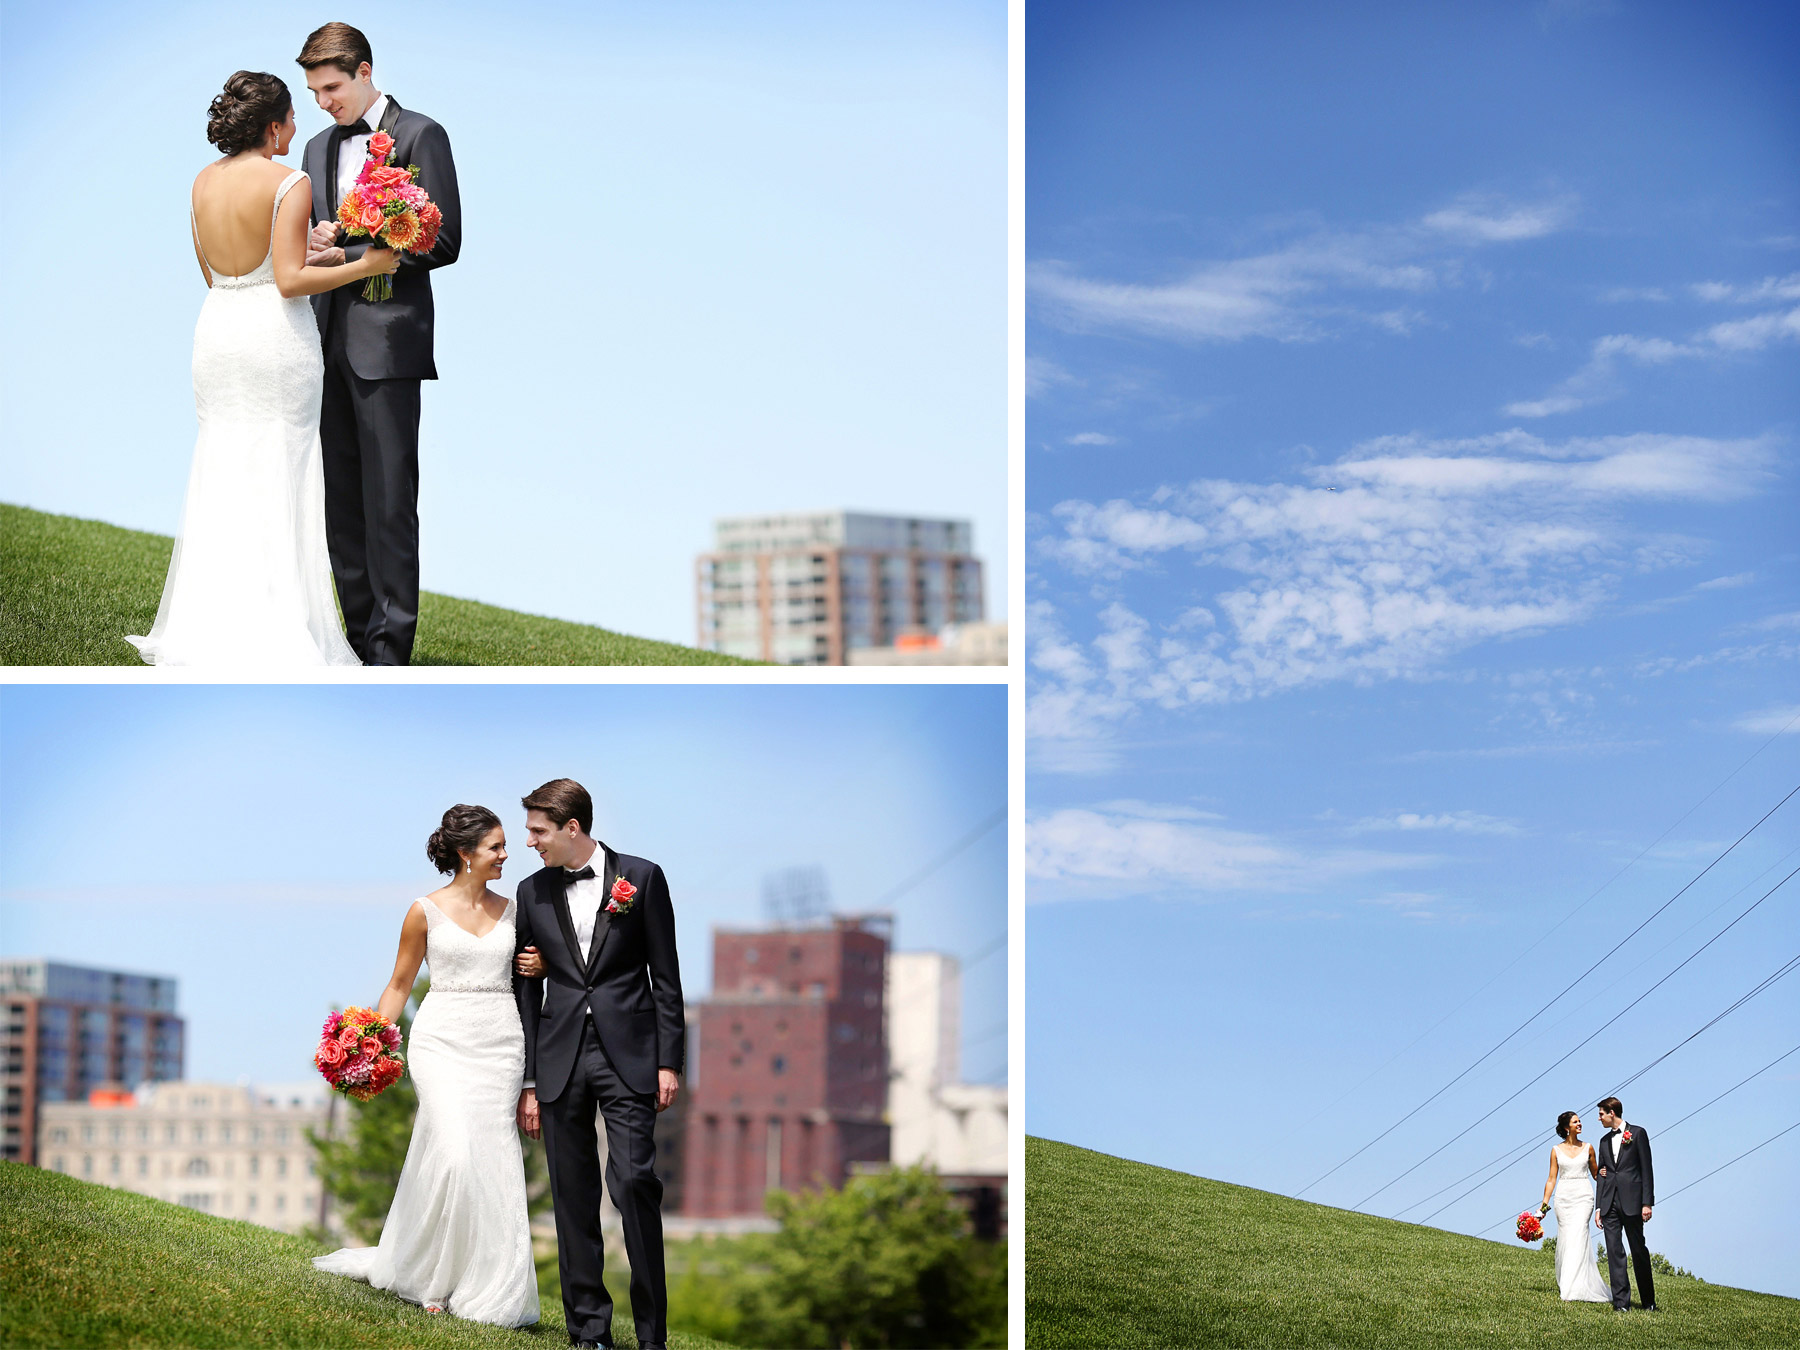 06-Minneapolis-Minnesota-Wedding-Photography-by-Vick-Photography-First-Look-Blue-Sky-Lalu-&-John.jpg